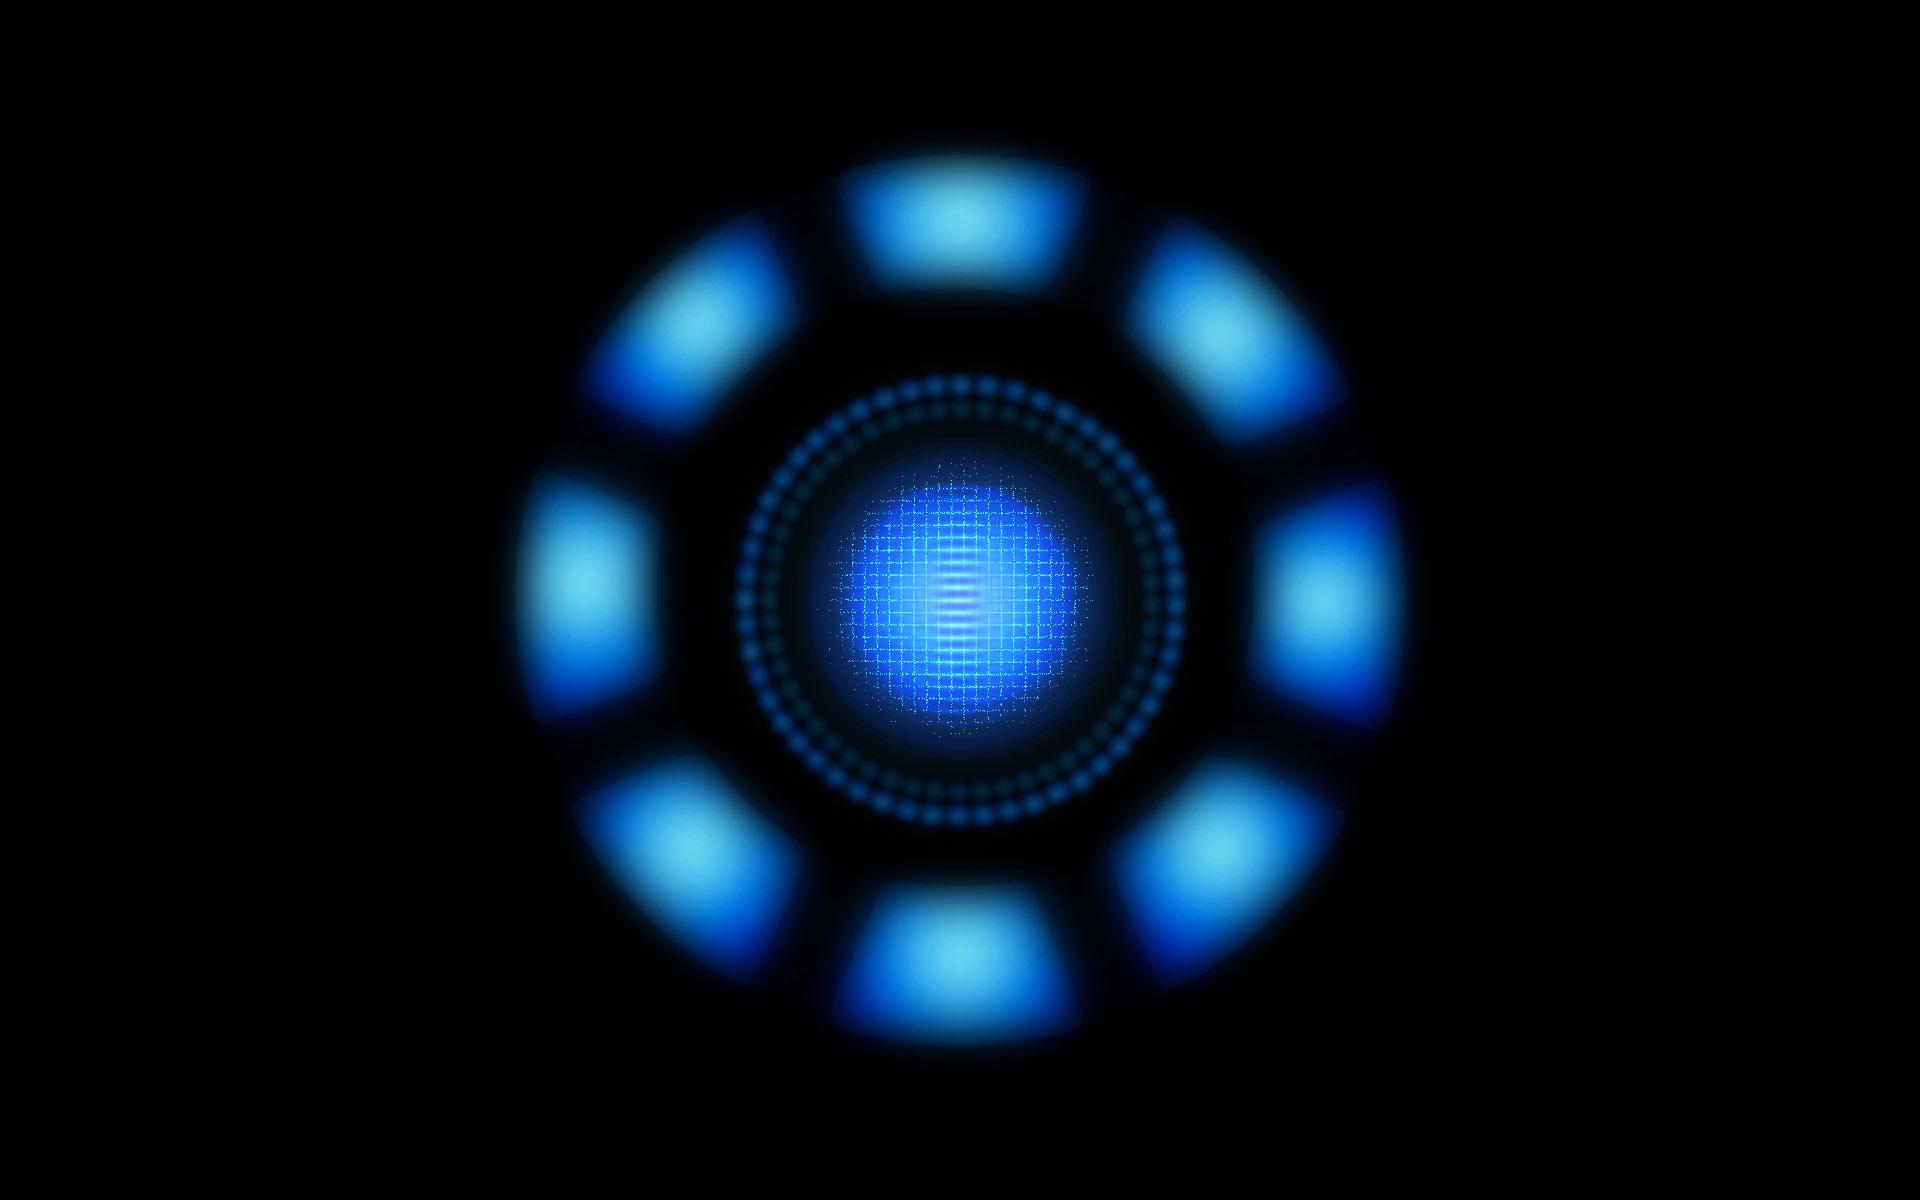 Iron Man Logo Wallpaper 4111 Hd Wallpapers in Logos   Imagescicom 1920x1200